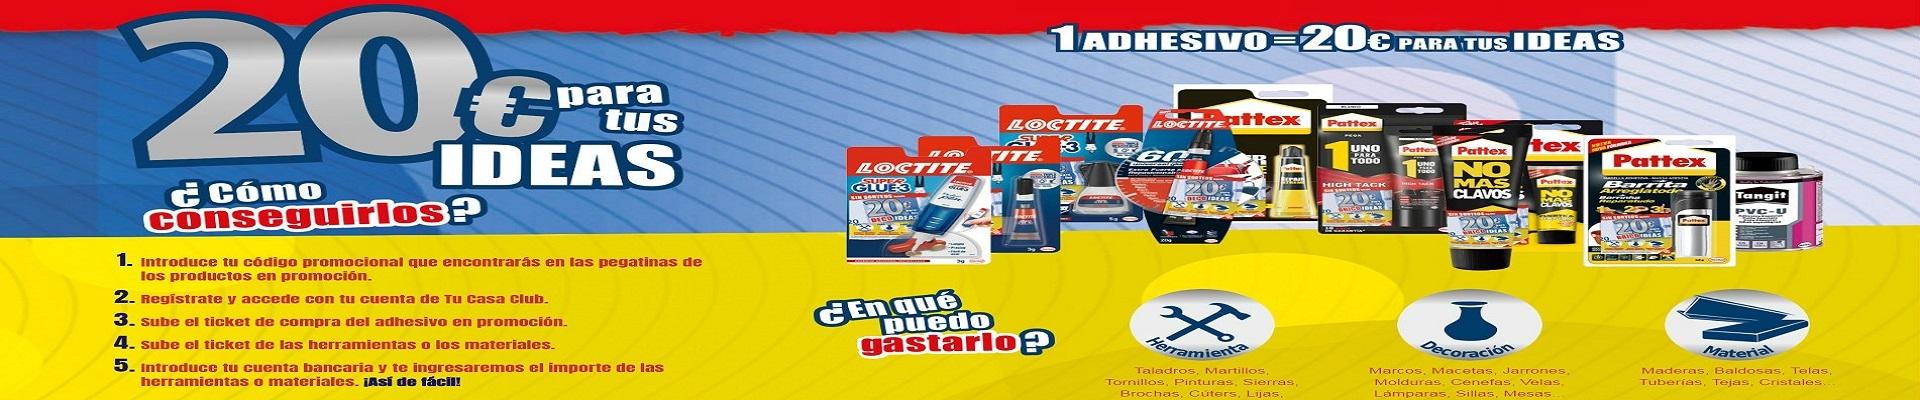 Promo Loctite 20€ GRATIS SIN SORTEOS